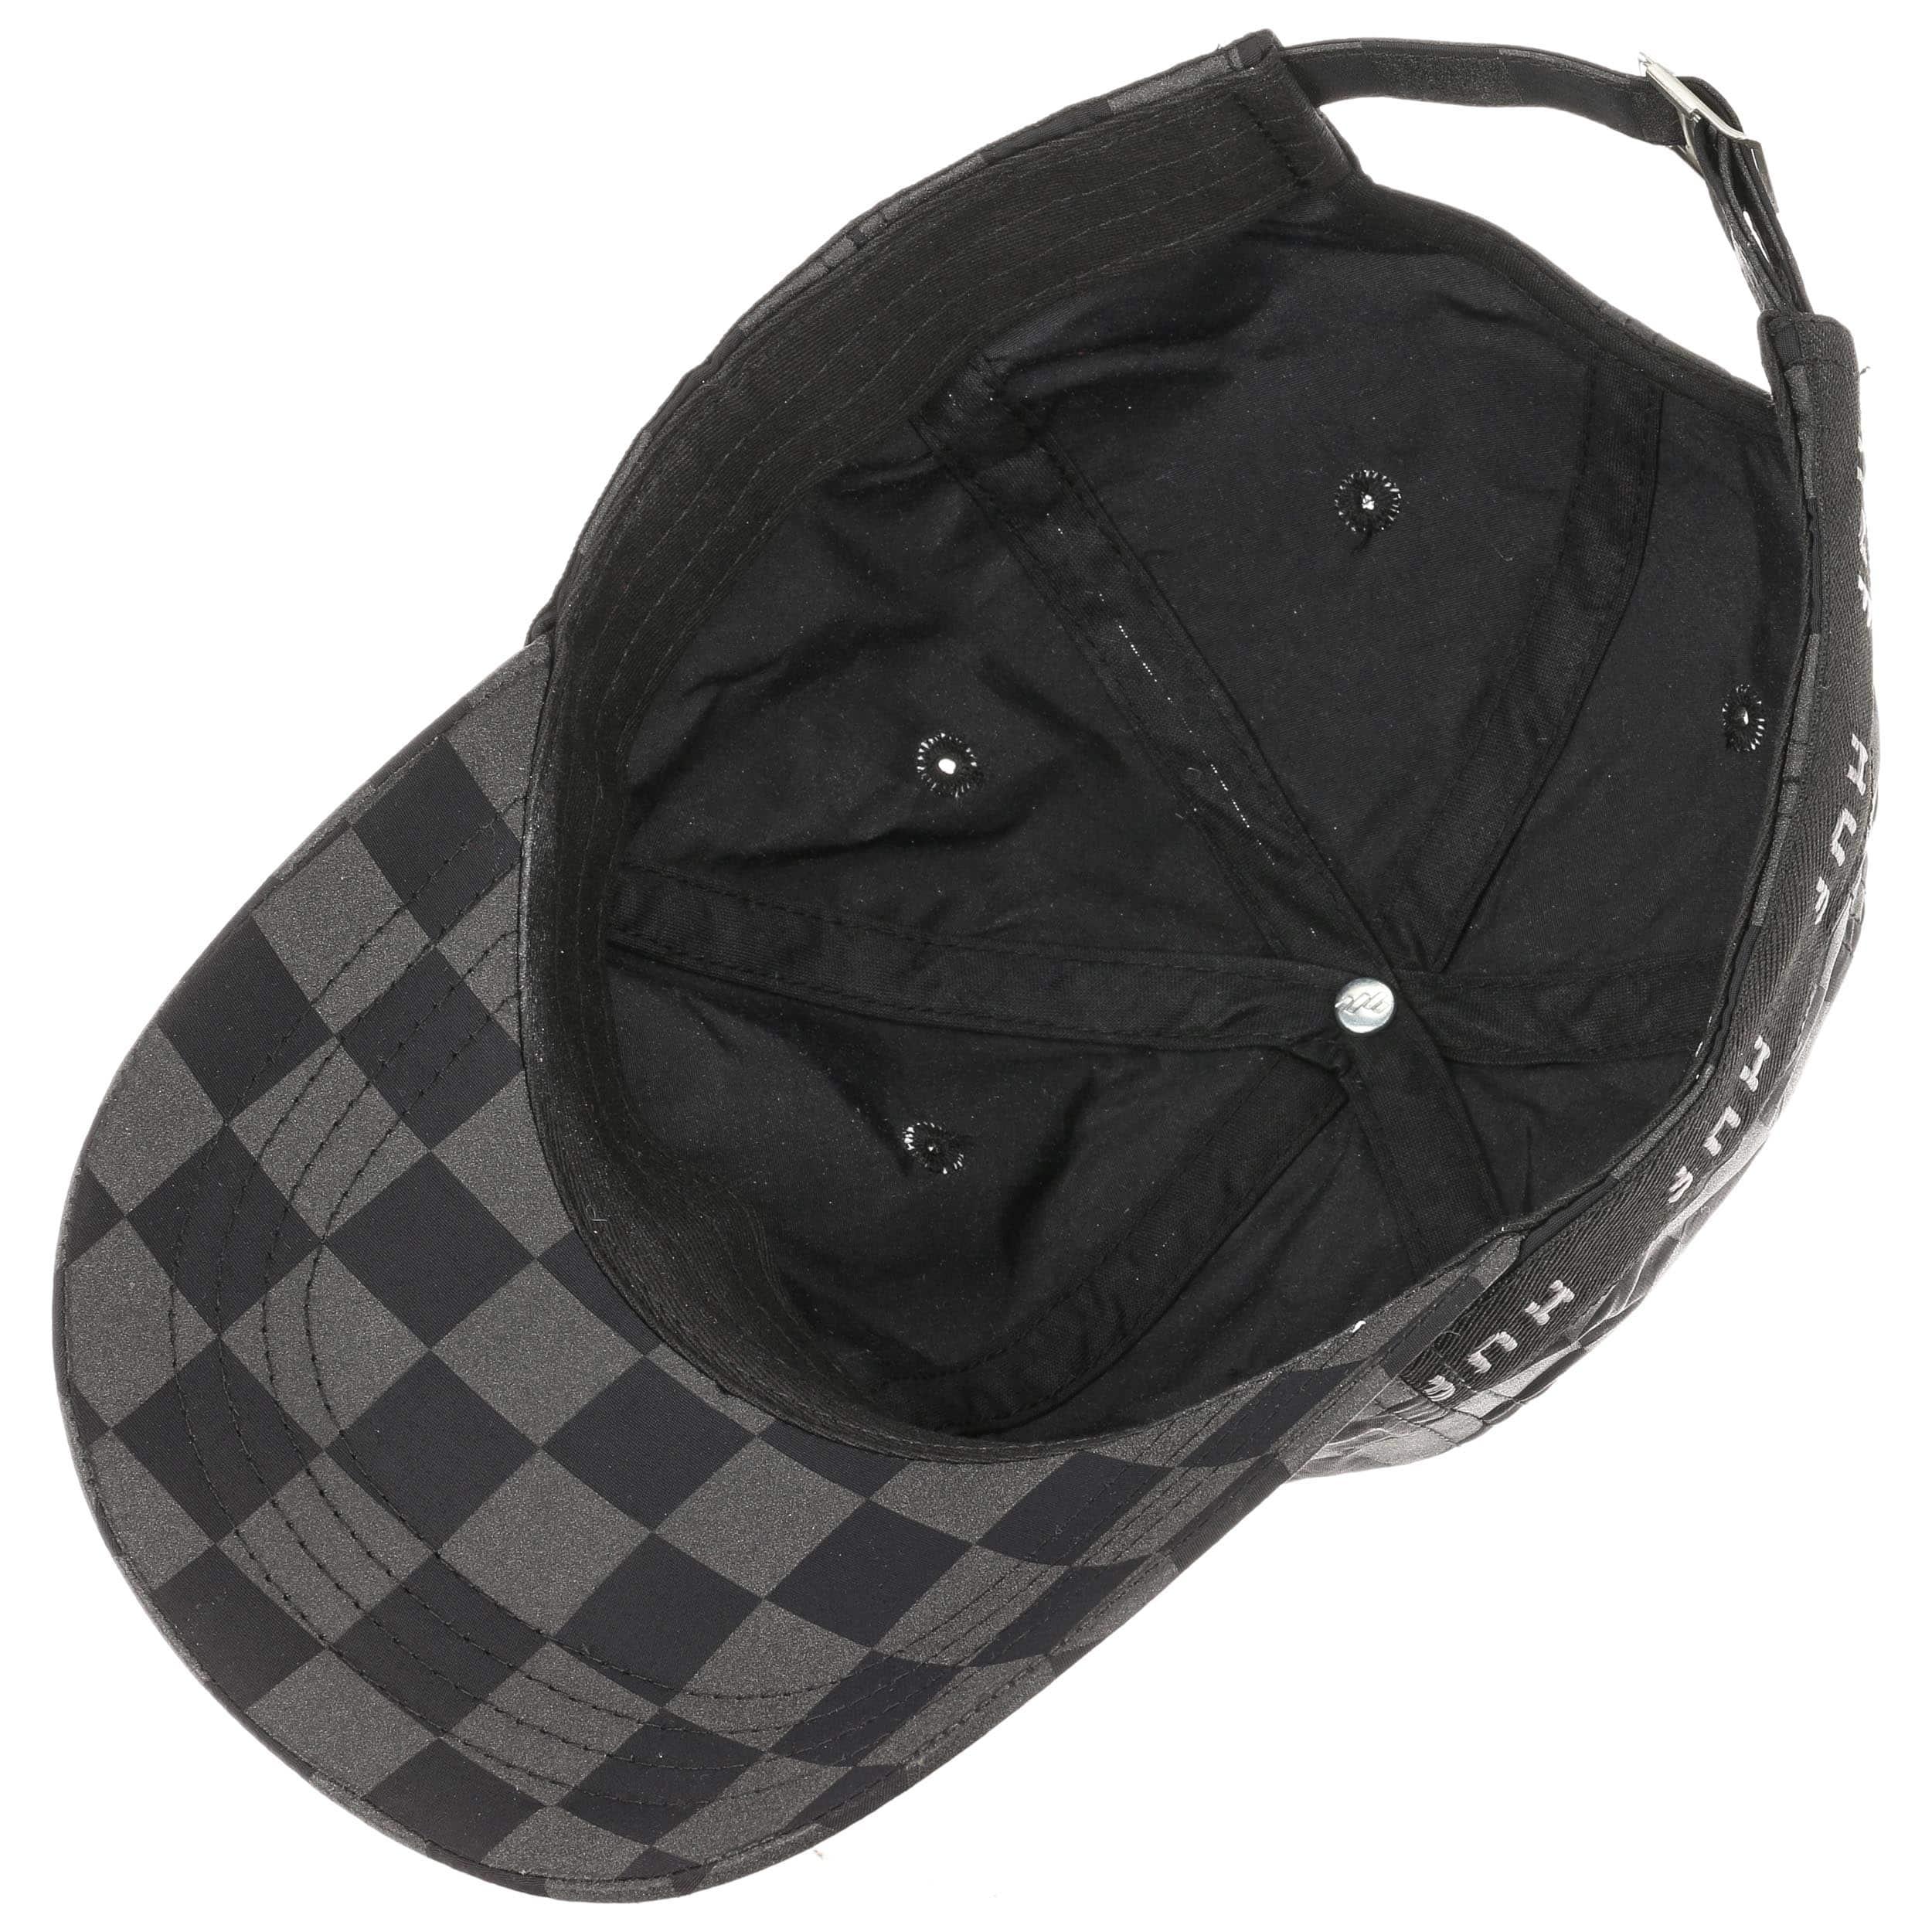 ... Blackout Curved Strapback Cap by HUF - black 2 ... 8019b3a6e8a